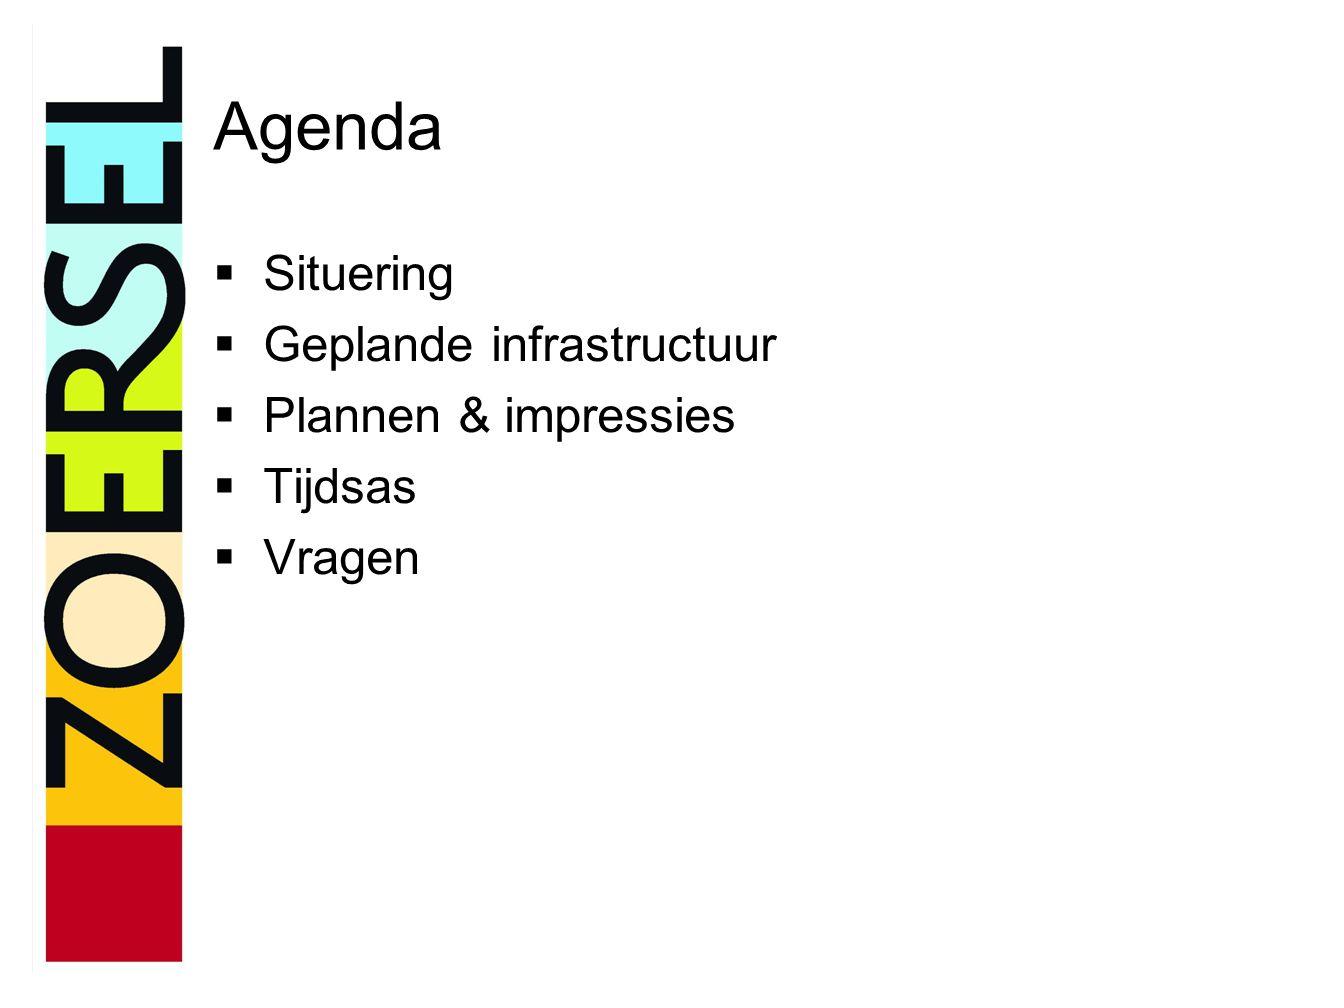 Agenda  Situering  Geplande infrastructuur  Plannen & impressies  Tijdsas  Vragen